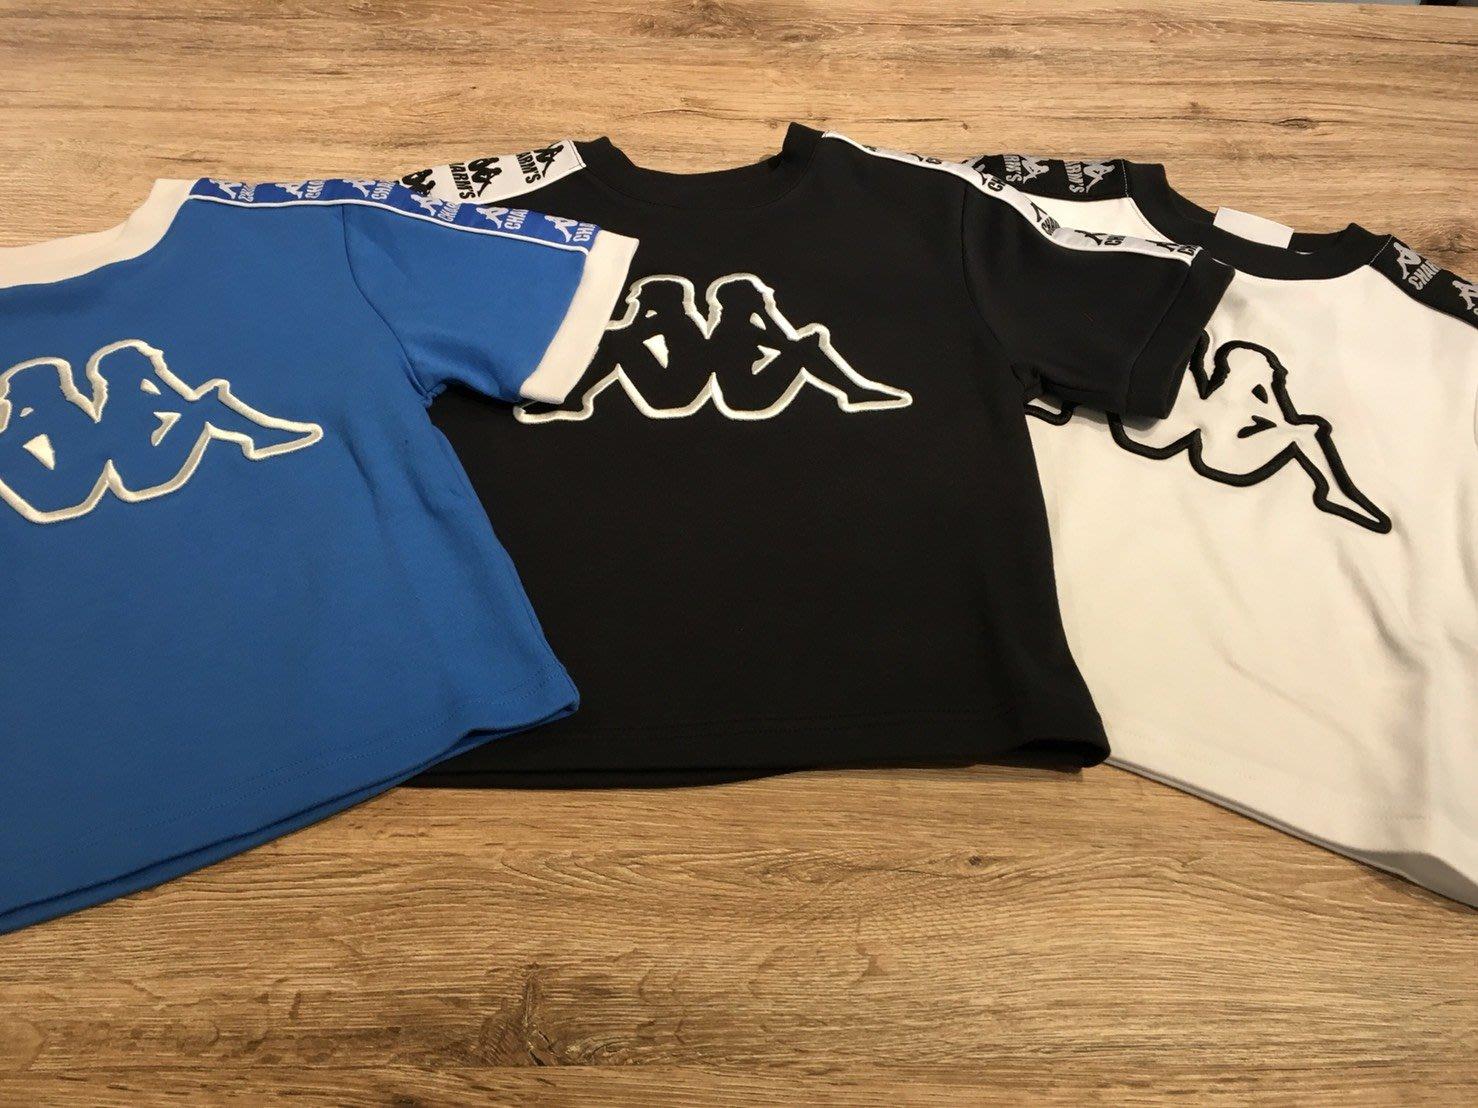 【MASS】KAPPA LOGO TEE 韓國限定 串標 短版 黑色 & 白色 & 藍色